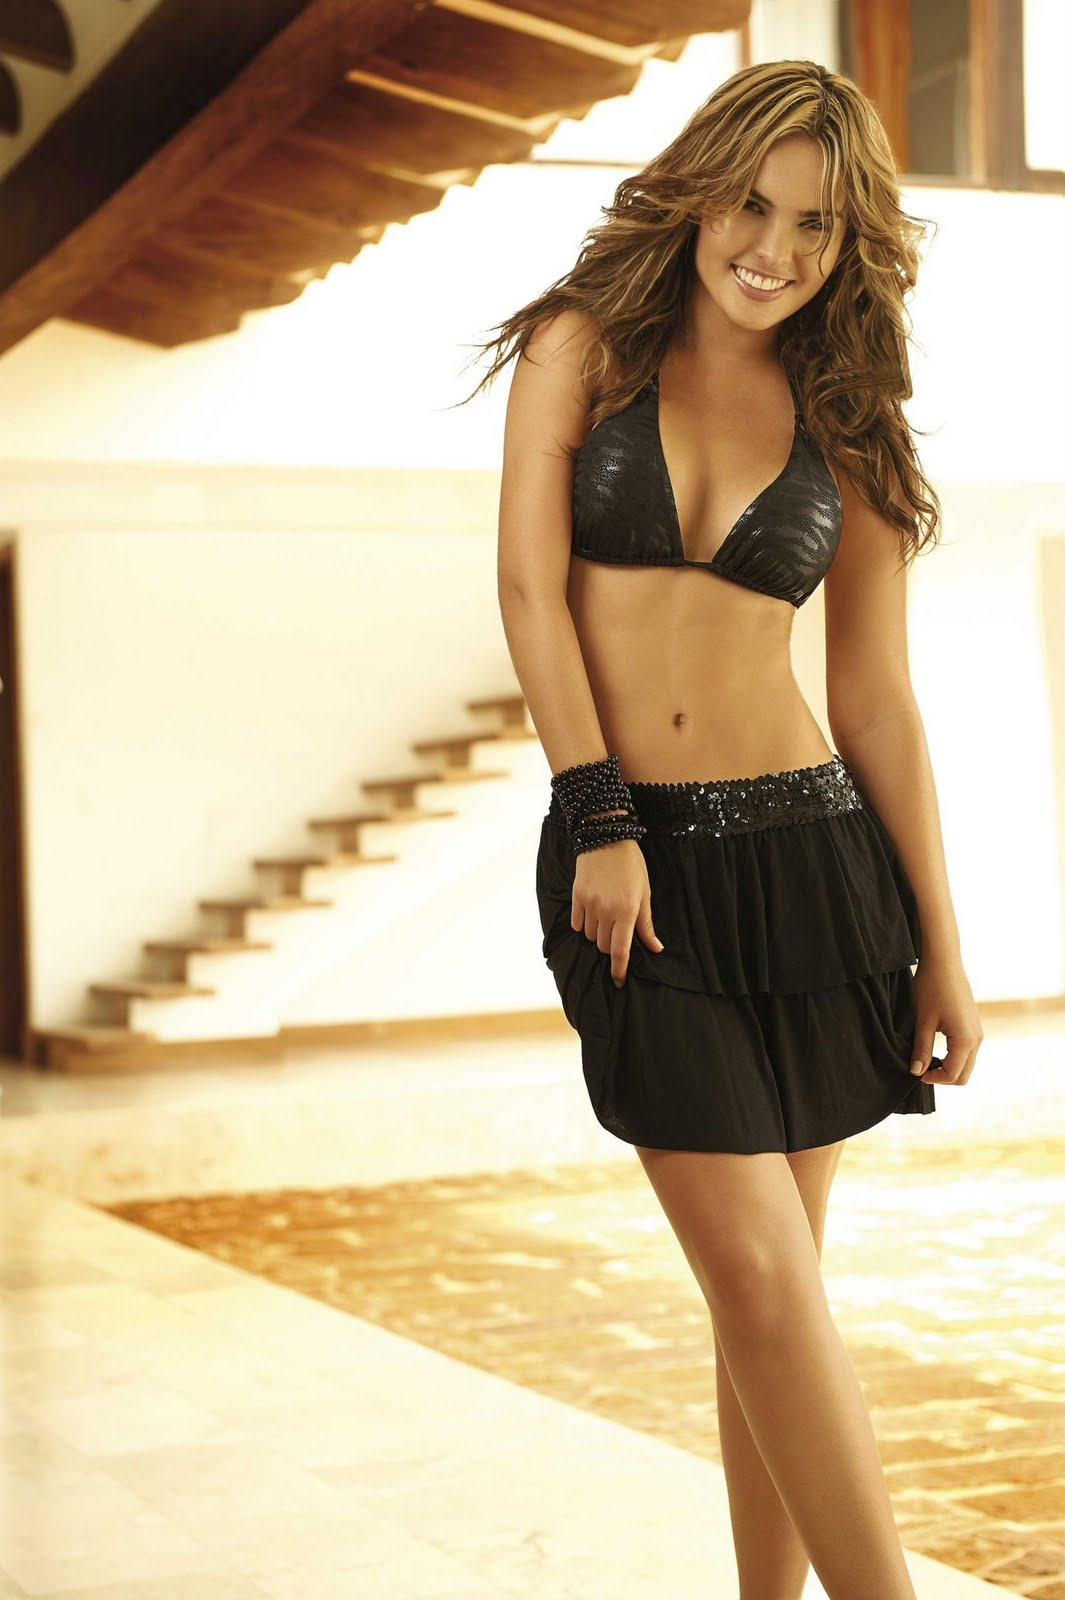 sexiest women in bikinis  melissa giraldo bikini